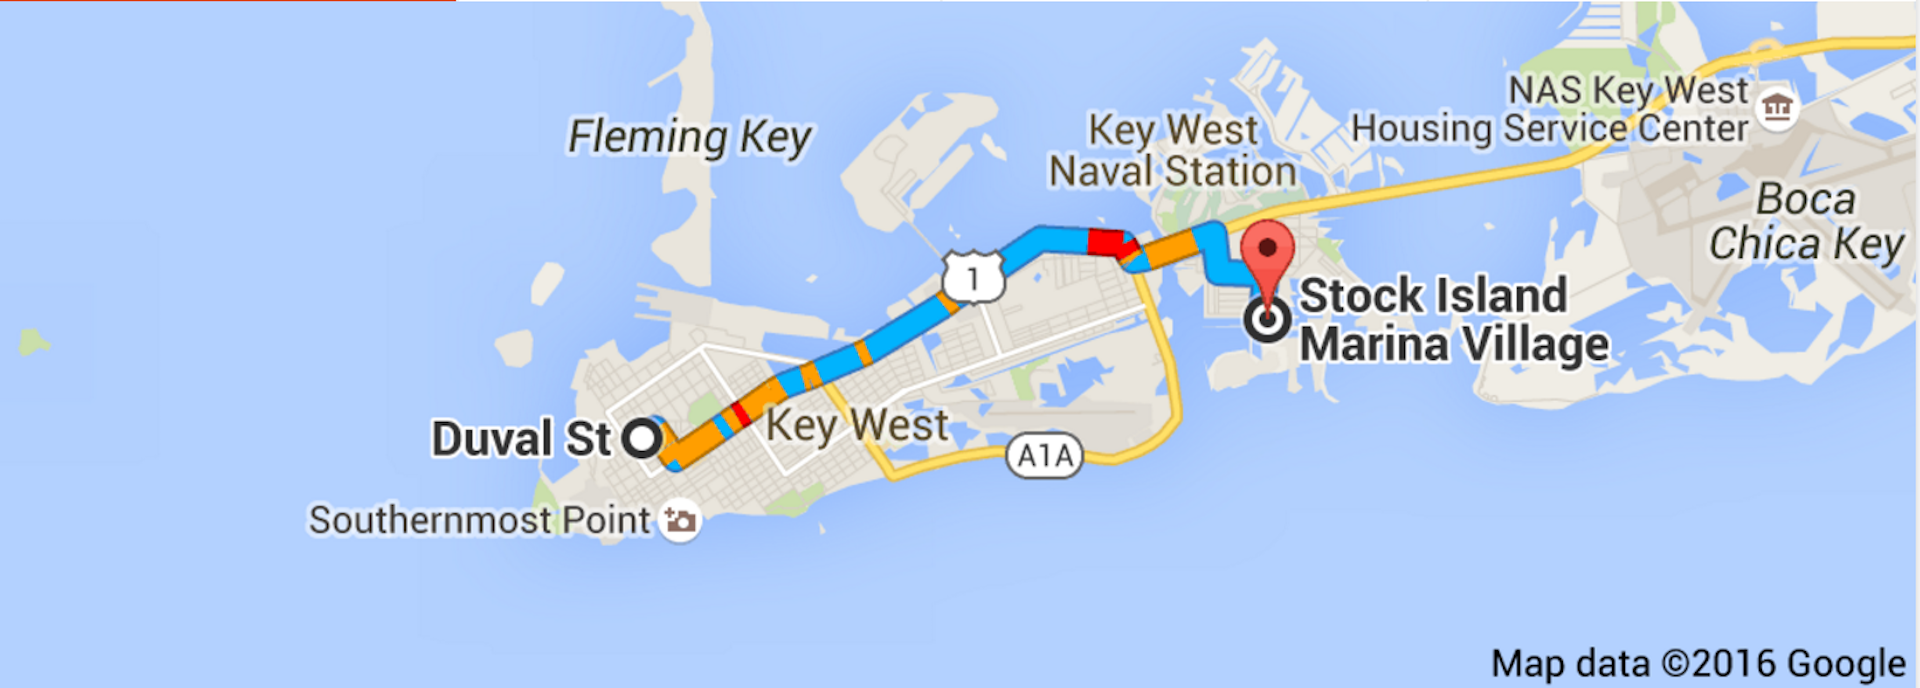 KeyWest to Stock Island Marina